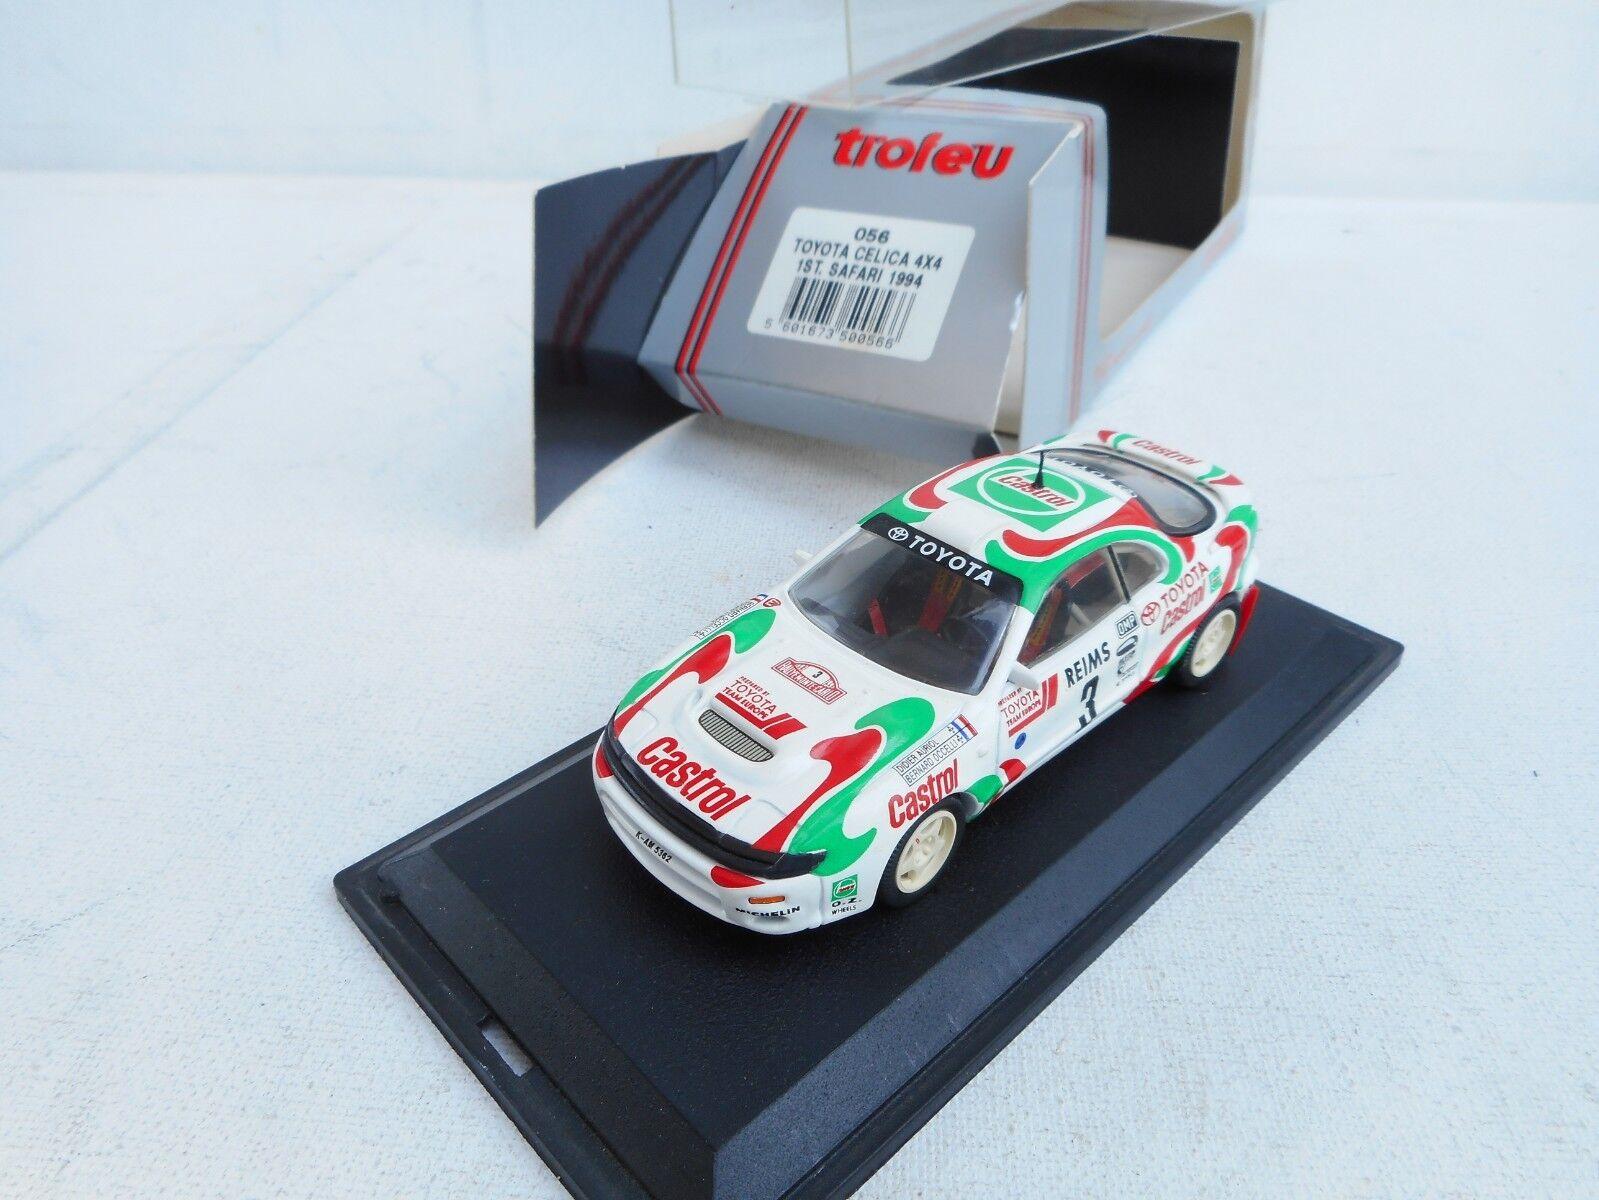 Trofeu 1 43 - Toyota Celica 4X4 Castrol Winner Rallye Monte Carlo 1993 NM BOX